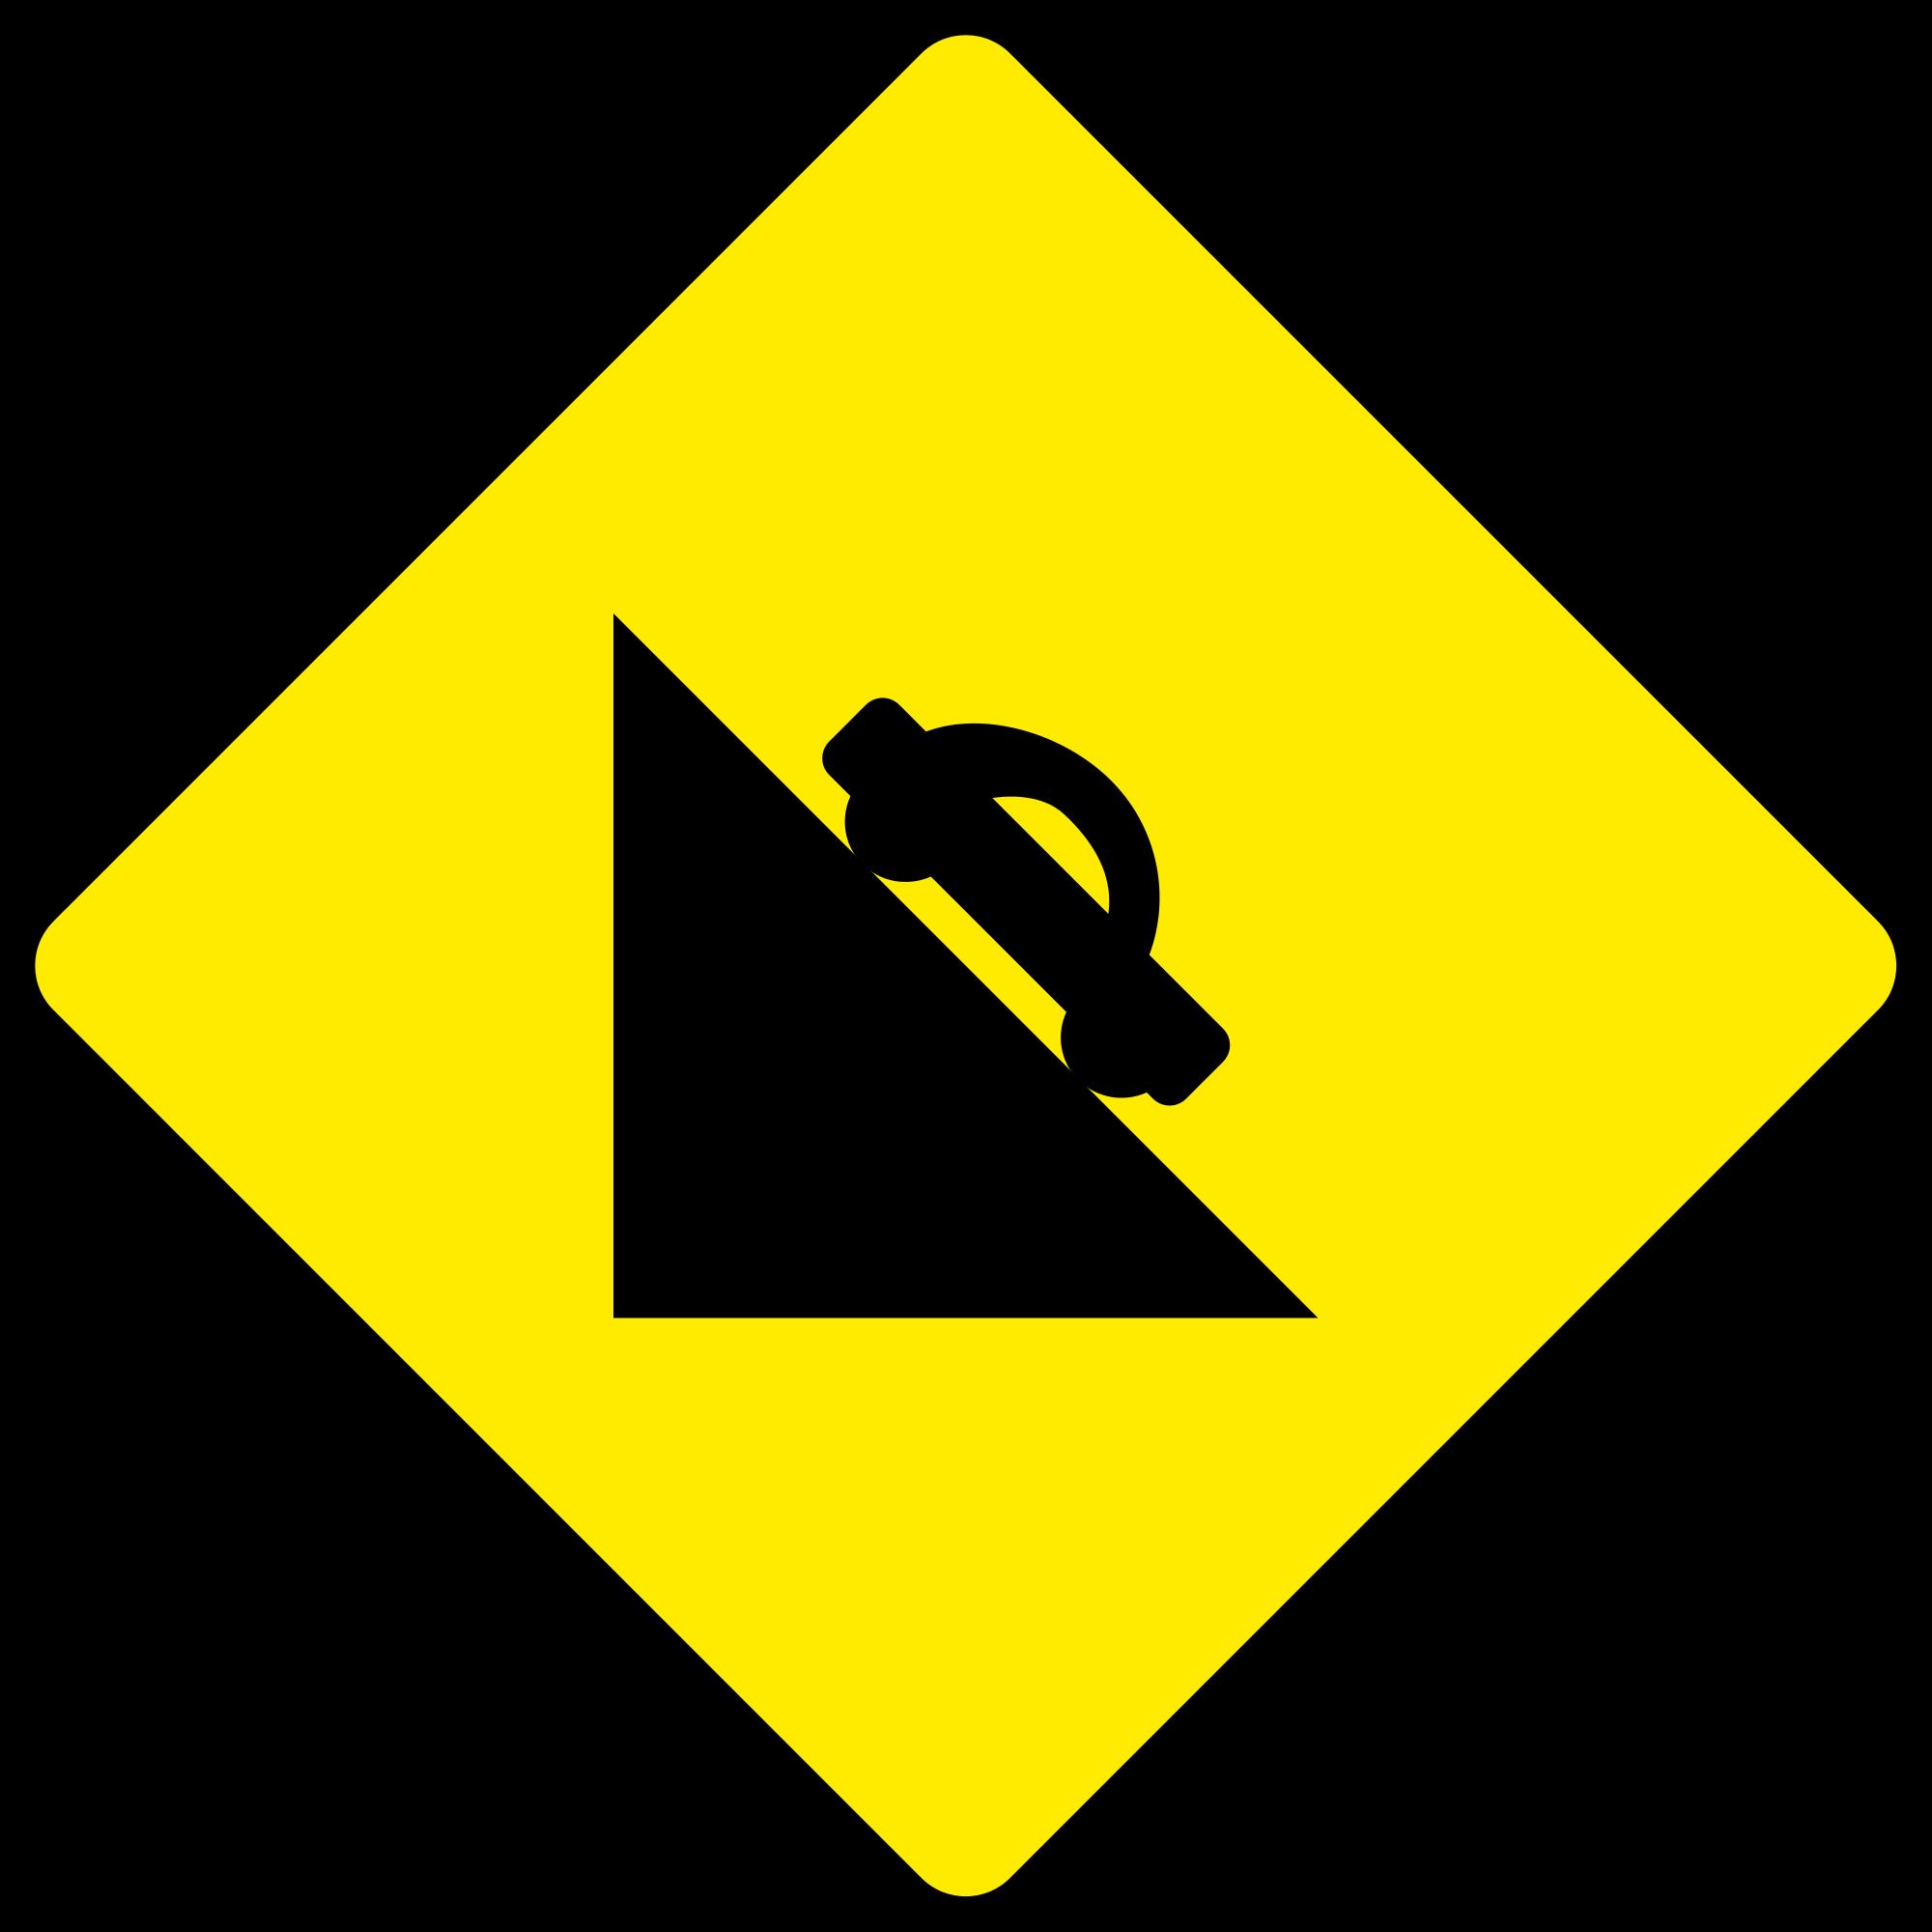 File:Ireland road sign W 105 (old).svg.